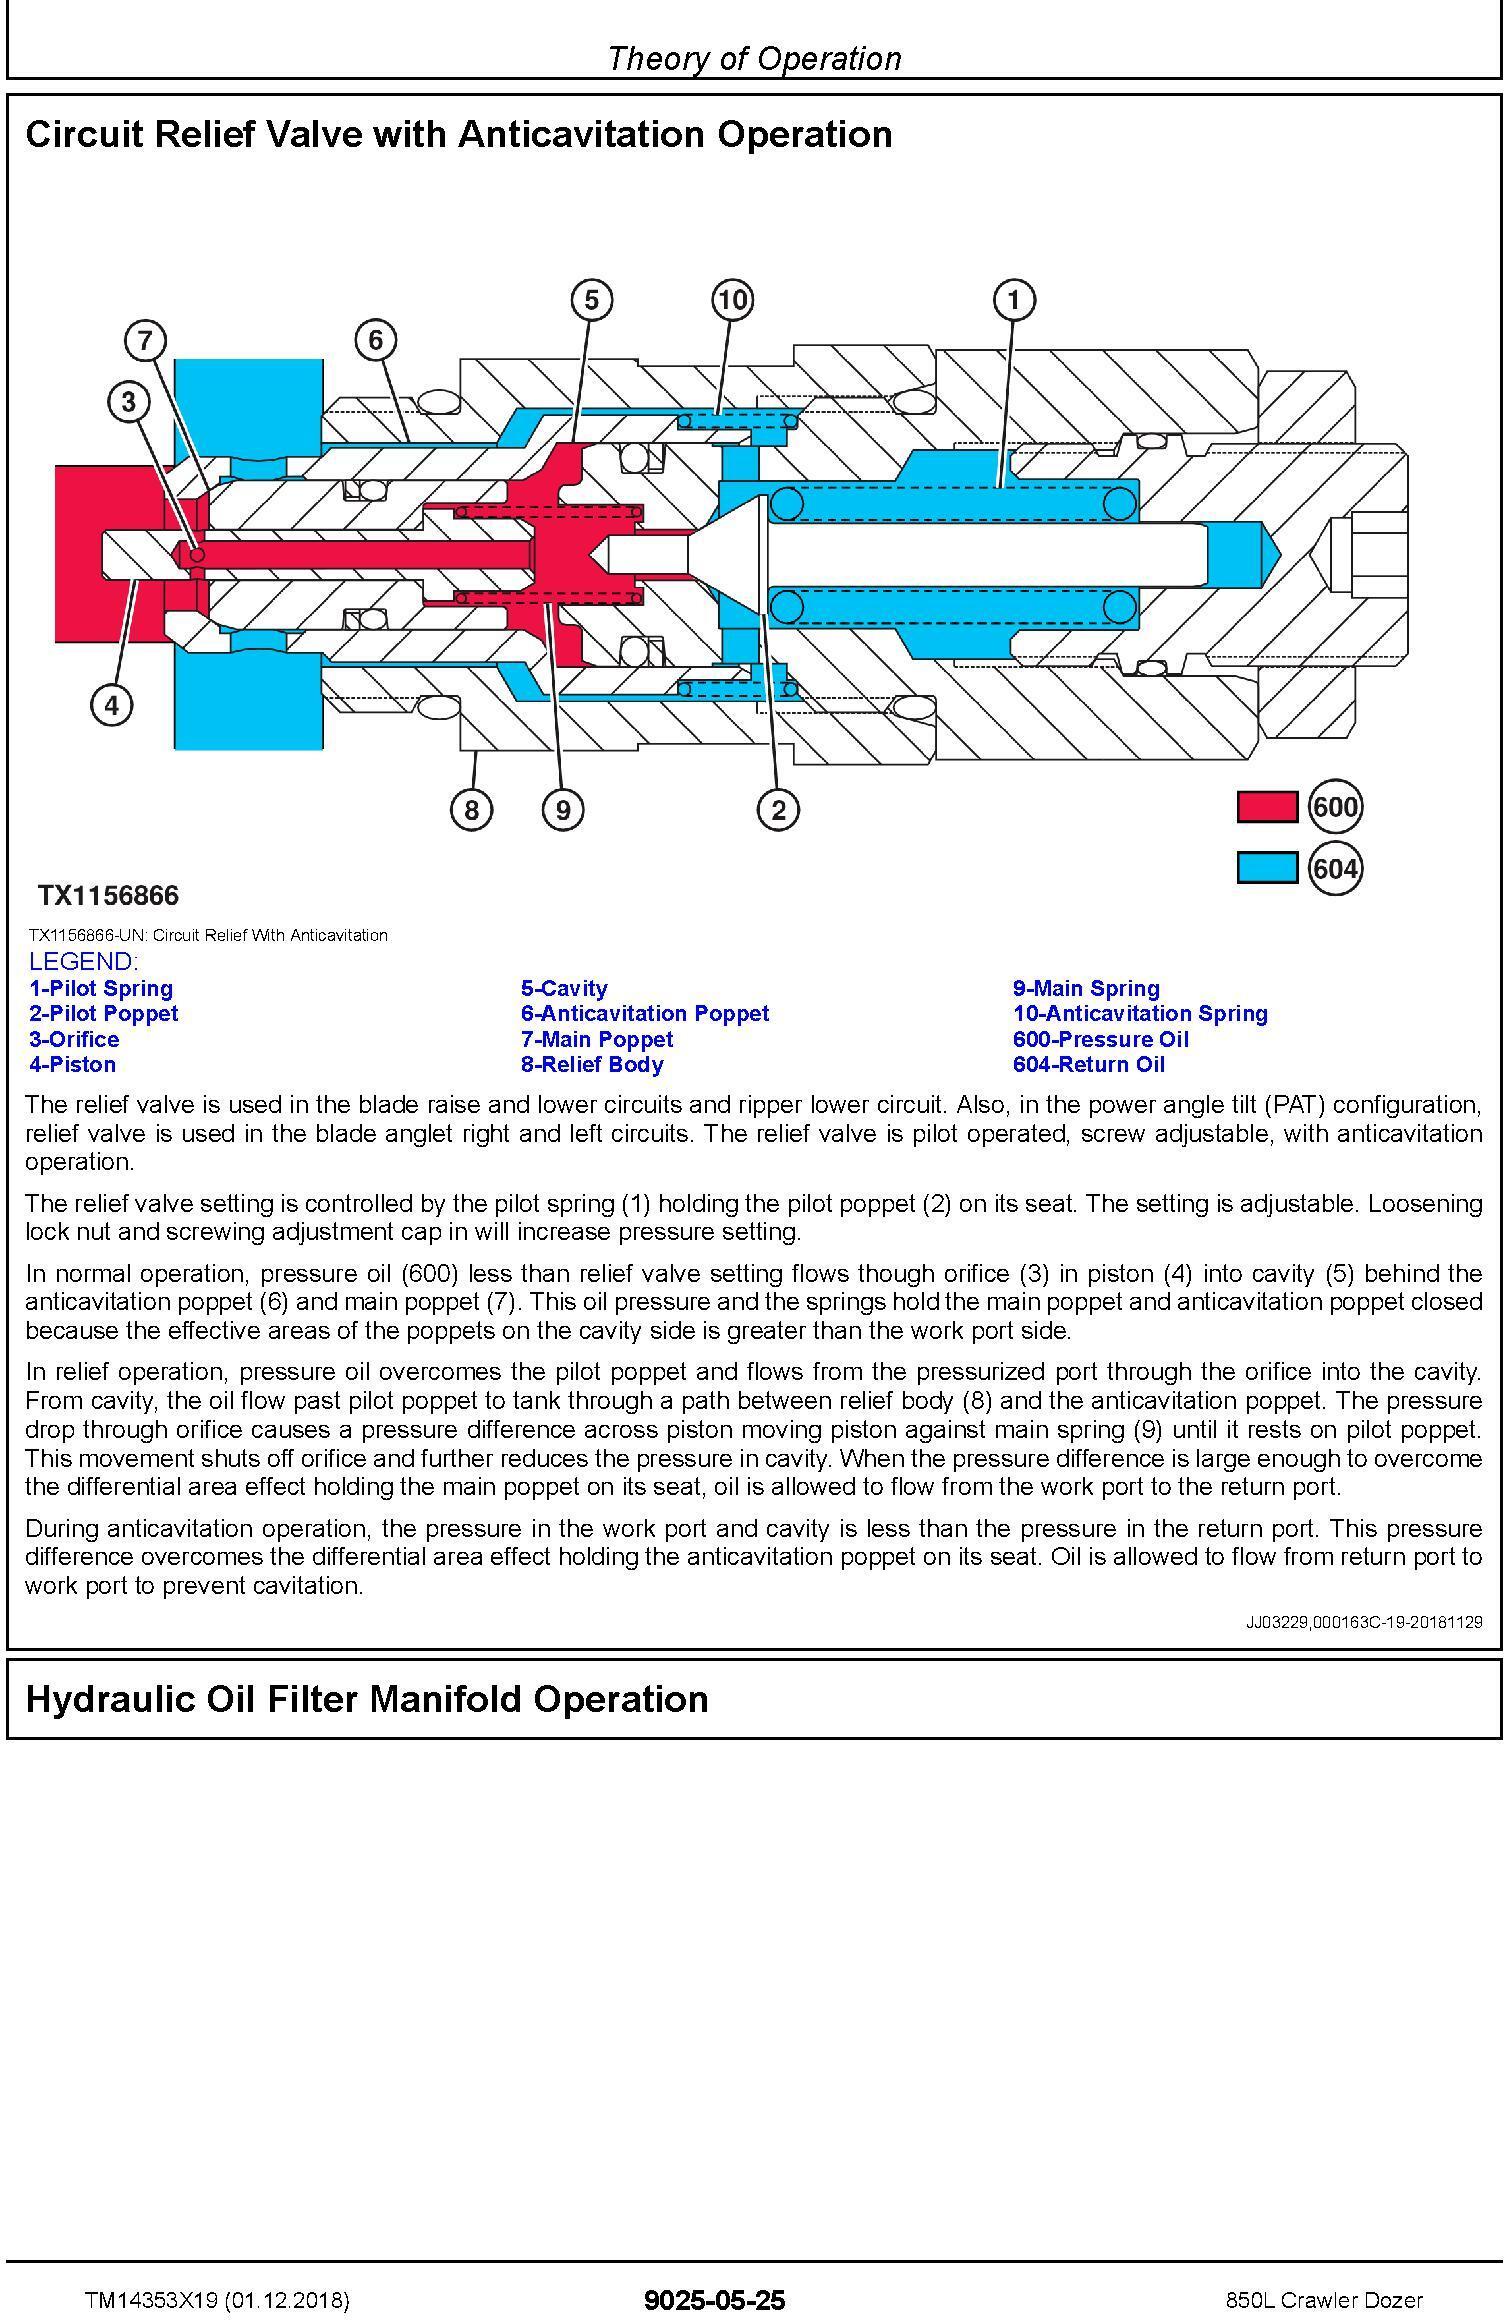 John Deere 850L Crawler Dozer Operation & Test Technical Manual (TM14353X19) - 3